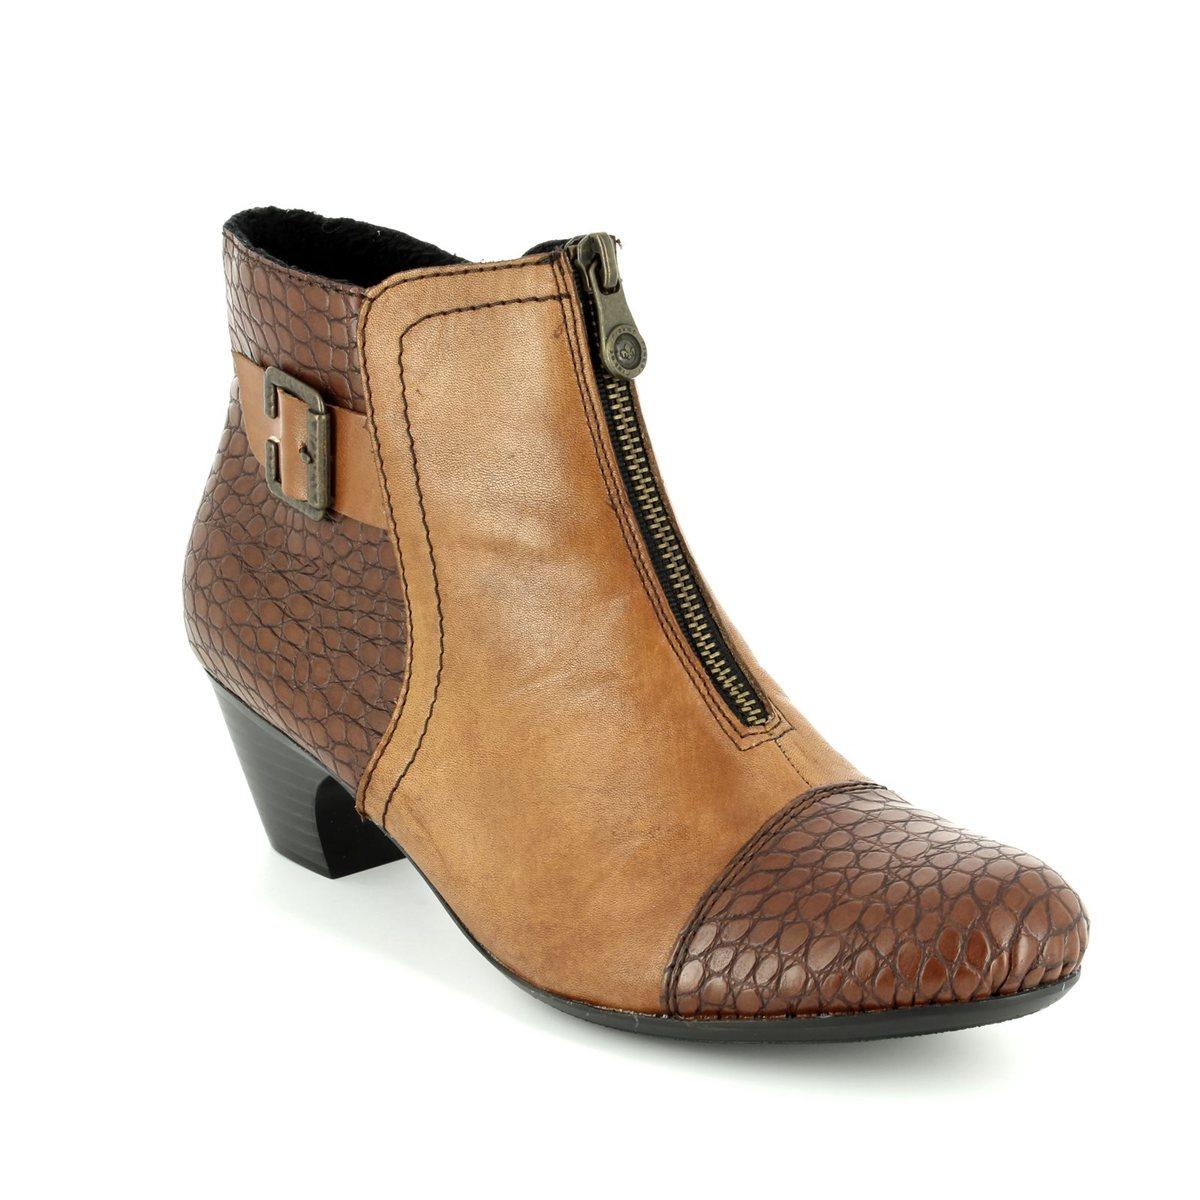 85d4cd04d7445 Rieker Ankle Boots - Tan multi - 70581-25 SARAZI